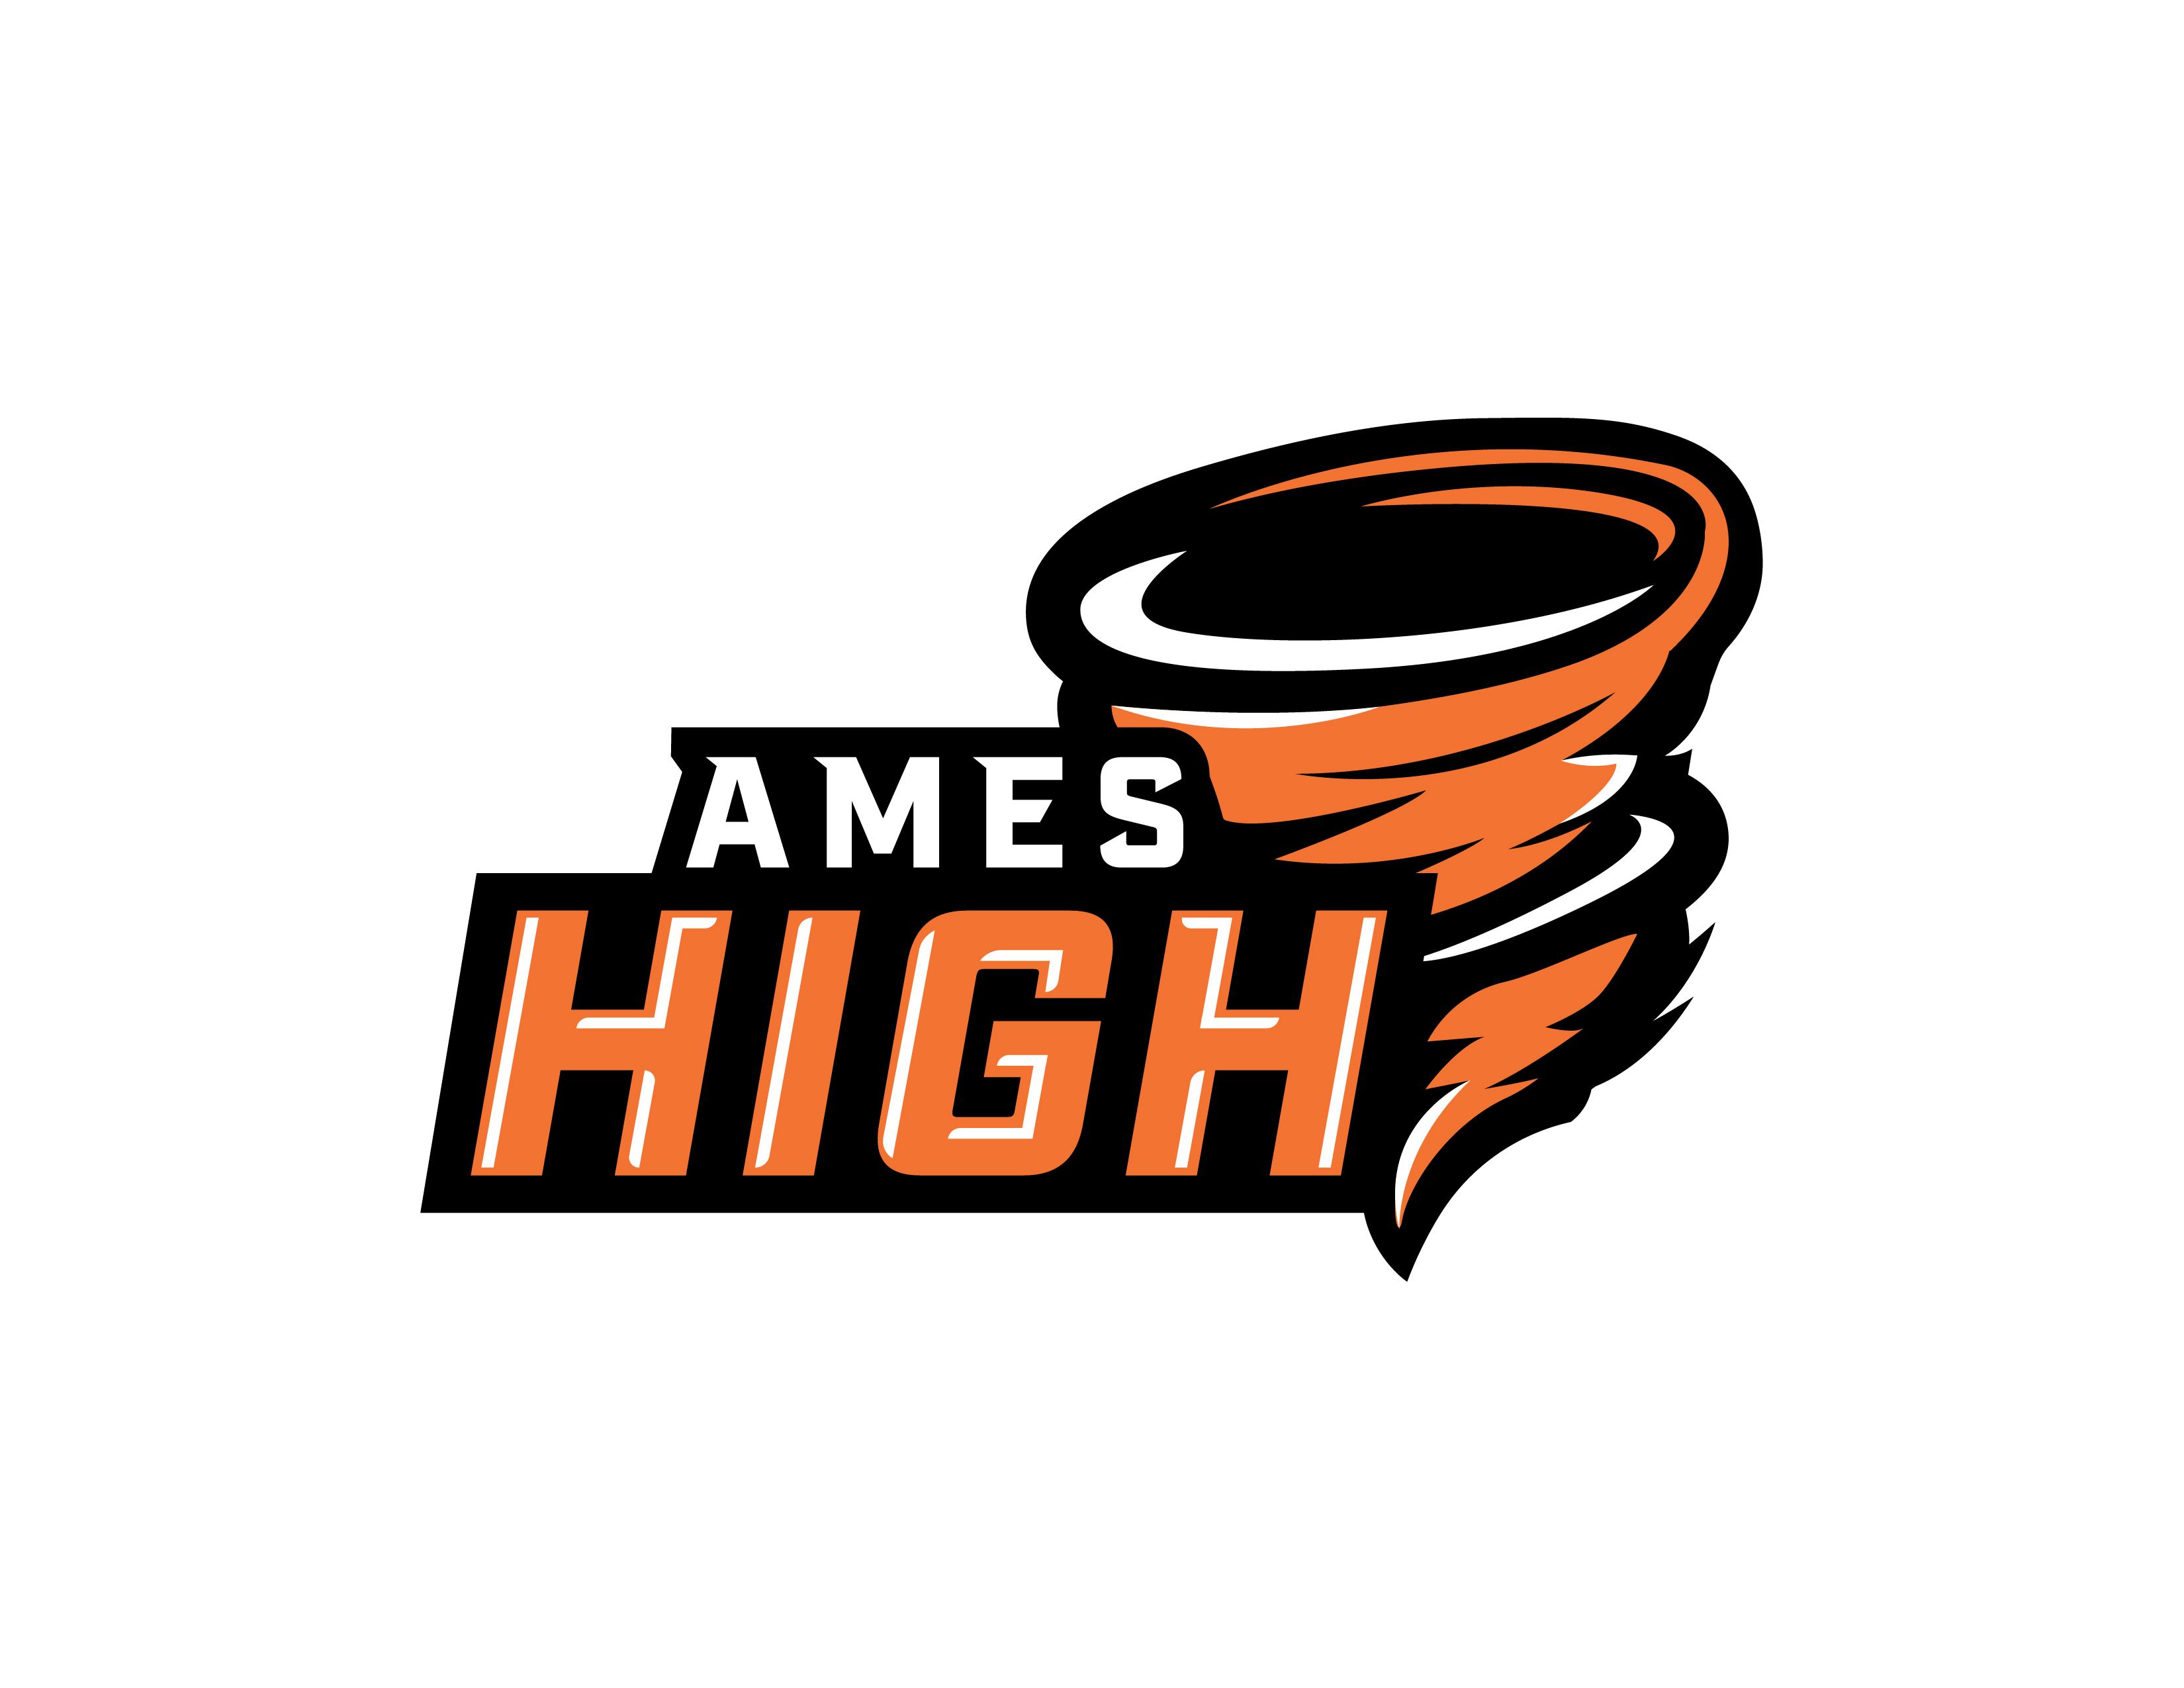 Ames High Mascot